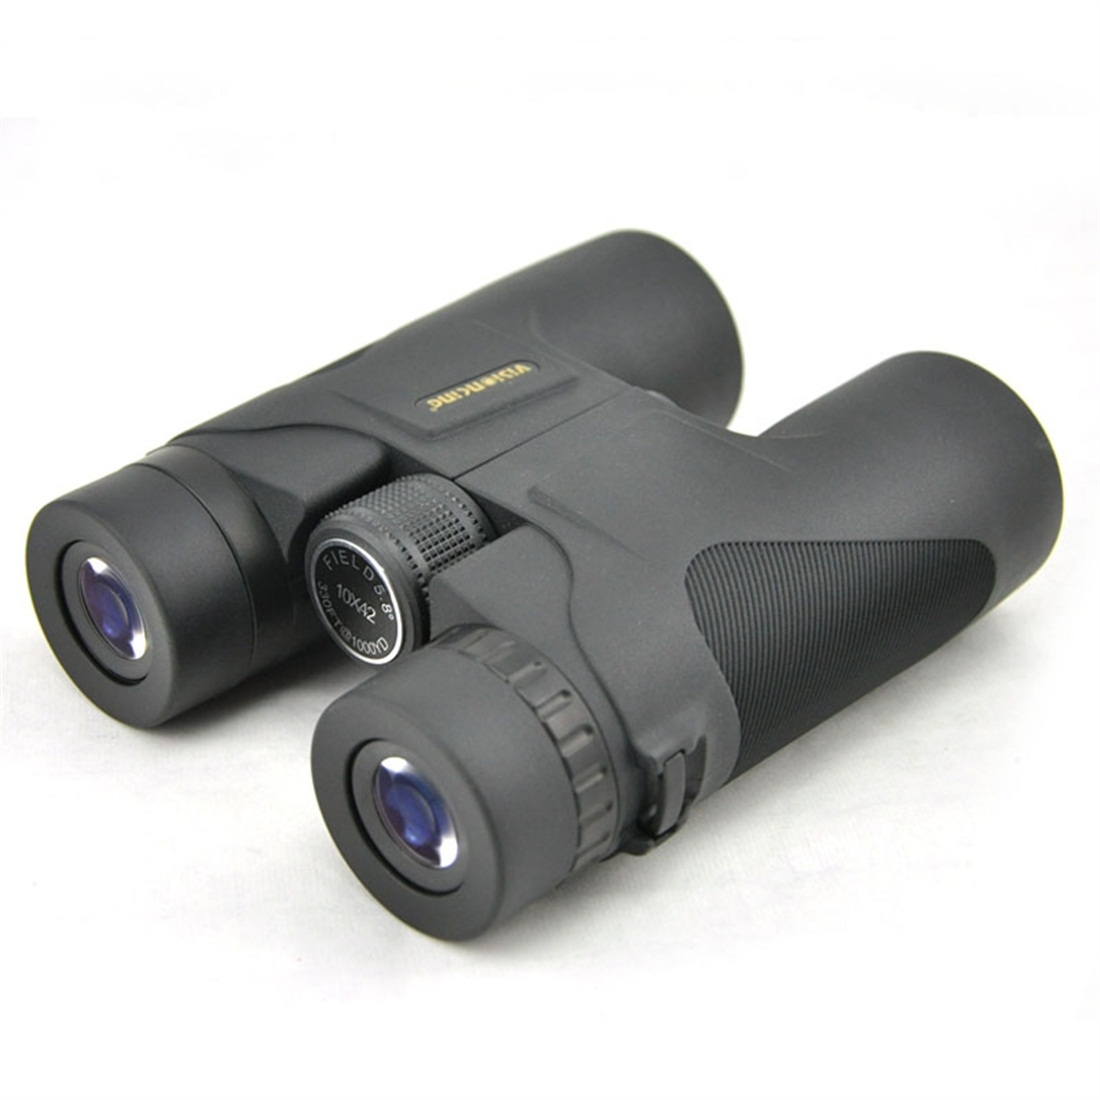 Visionking 10x42 Outdoor Sport Professional Waterproof Binoculars Telescope for Birdwatching / Hunting (Black)